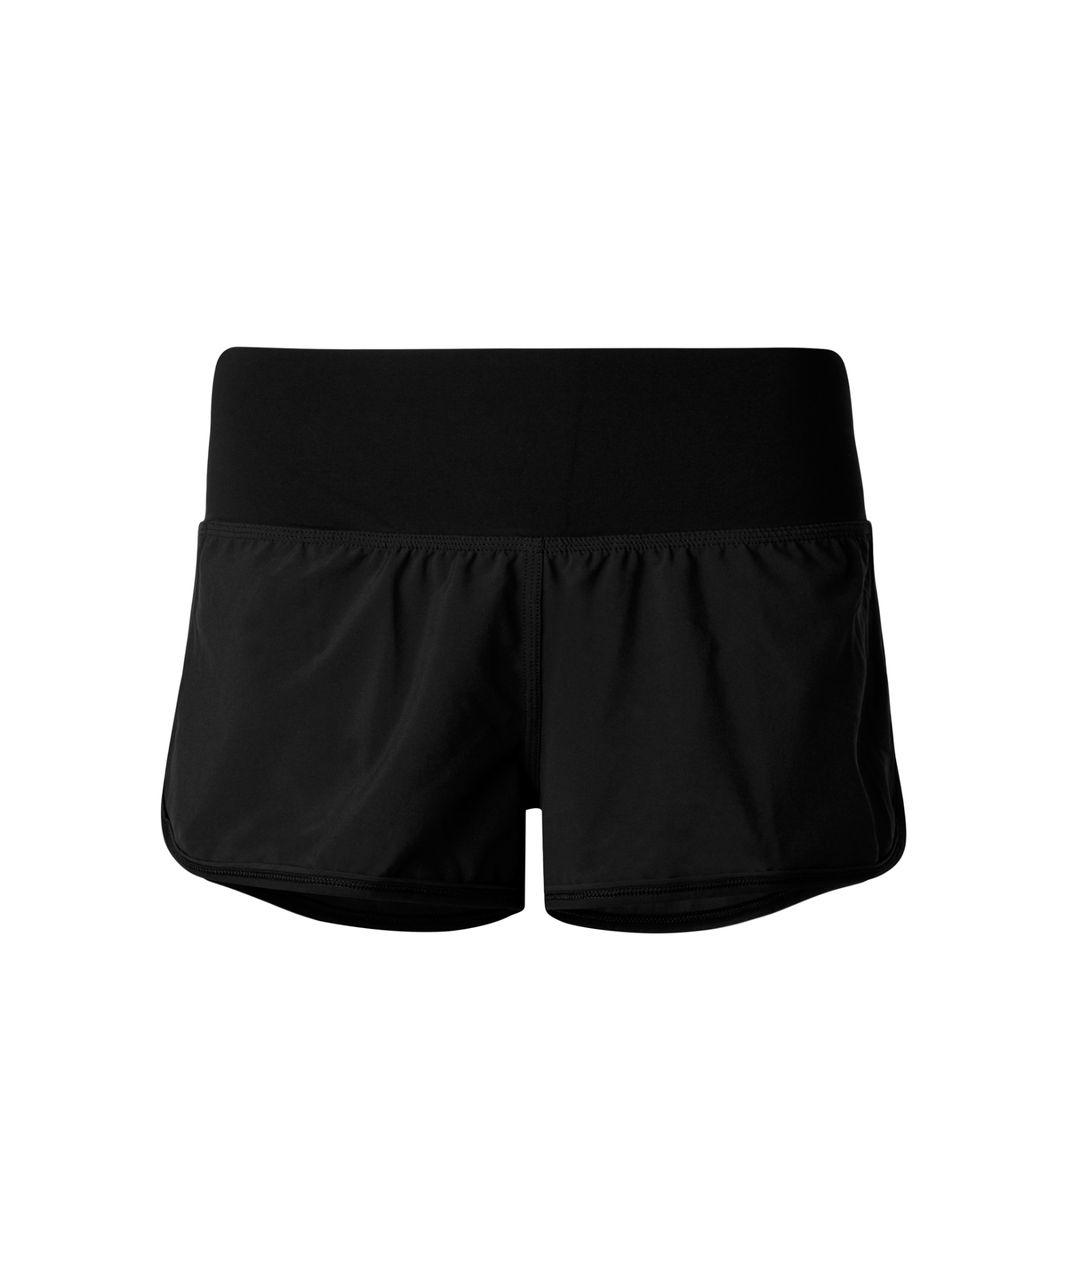 Lululemon Drop It Low Short - Black